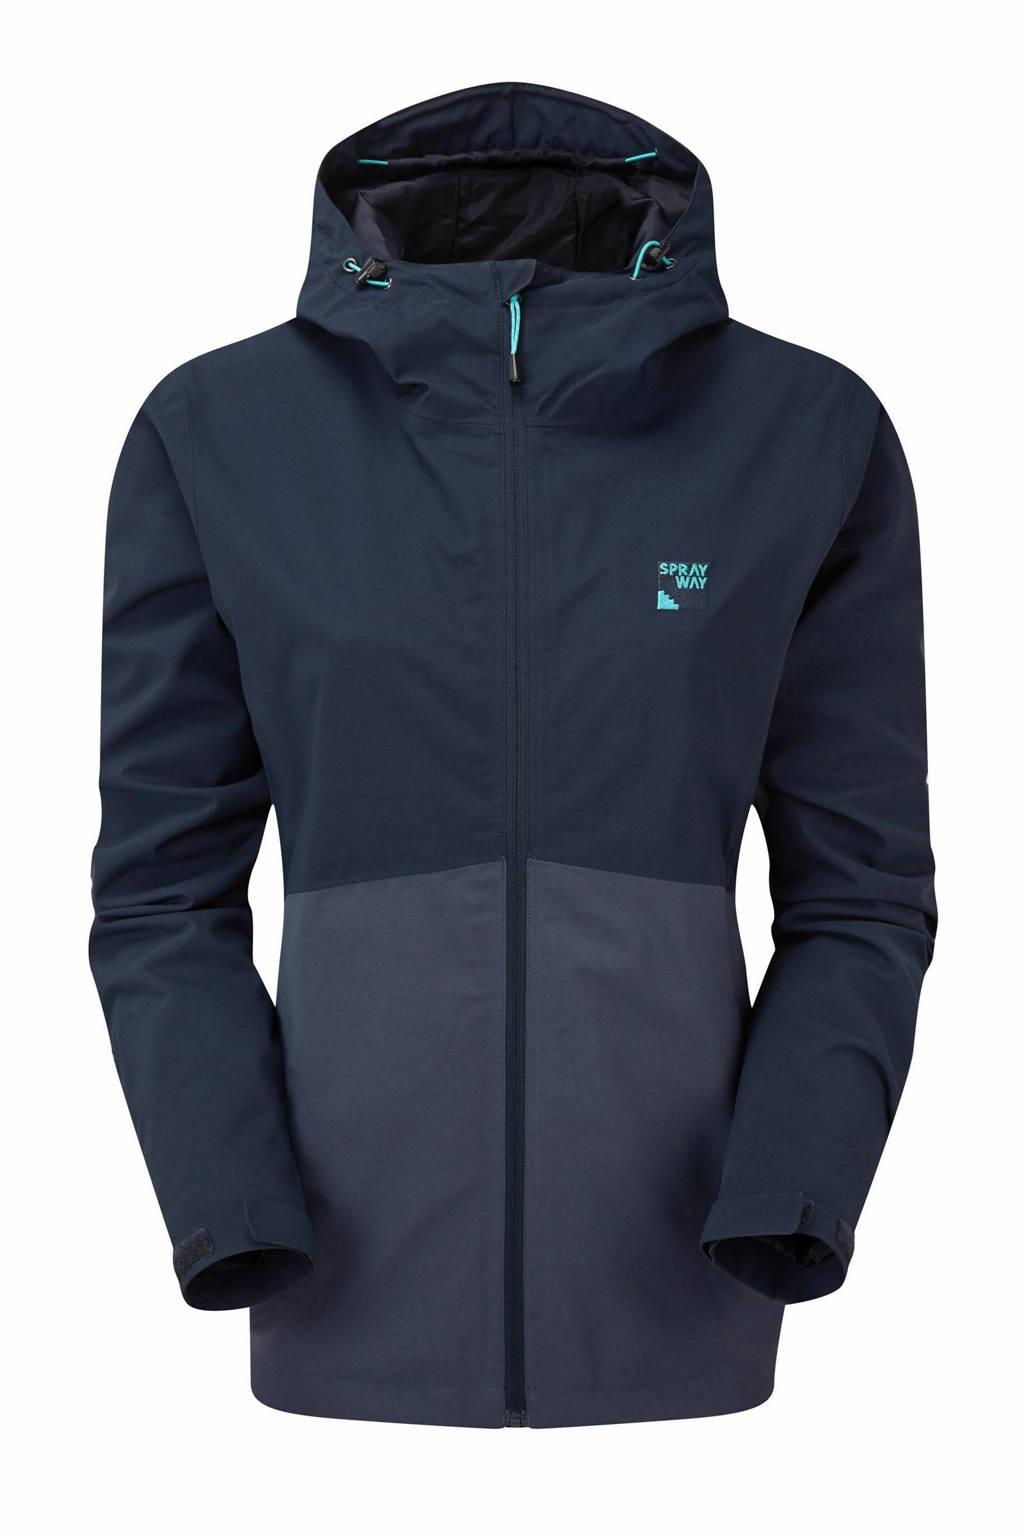 Sprayway outdoor jas Kyrre donkerblauw/blauw, Donkerblauw/blauw